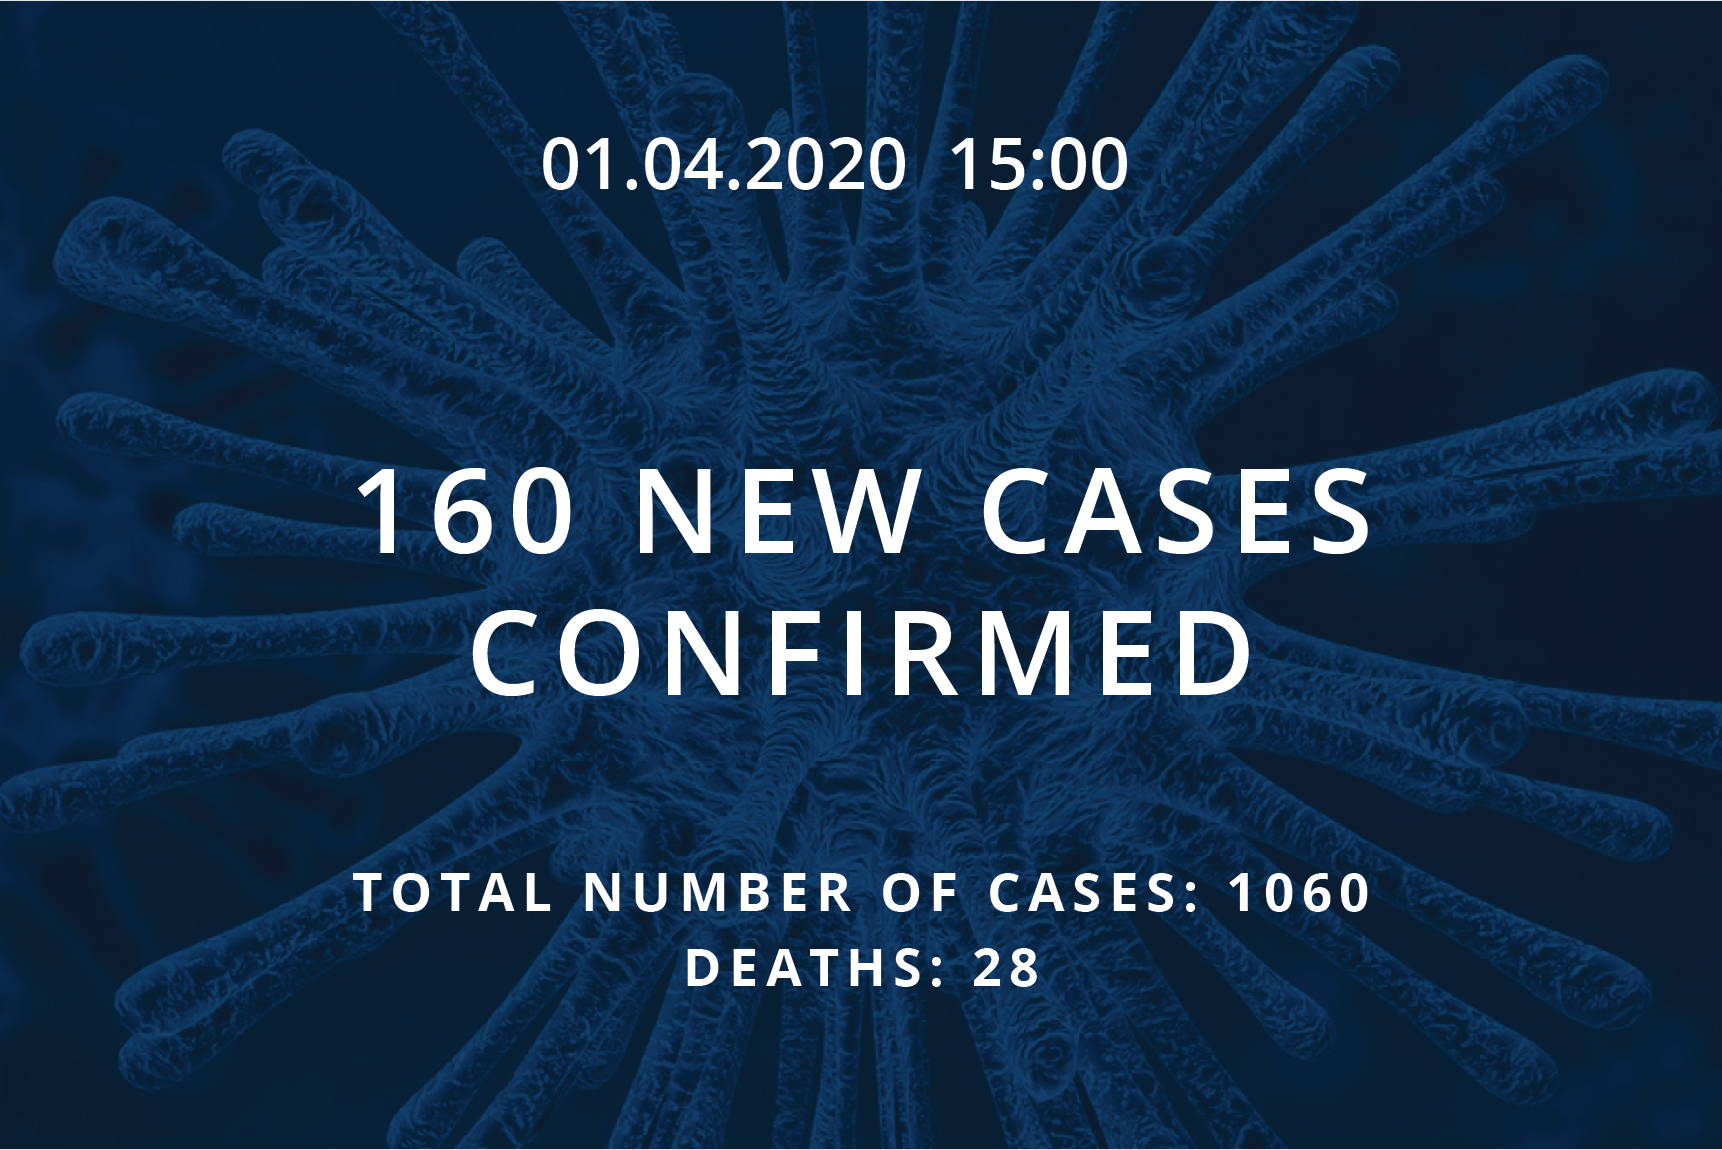 Information about coronavirus COVID-19, 01.04.2020 at 15:00